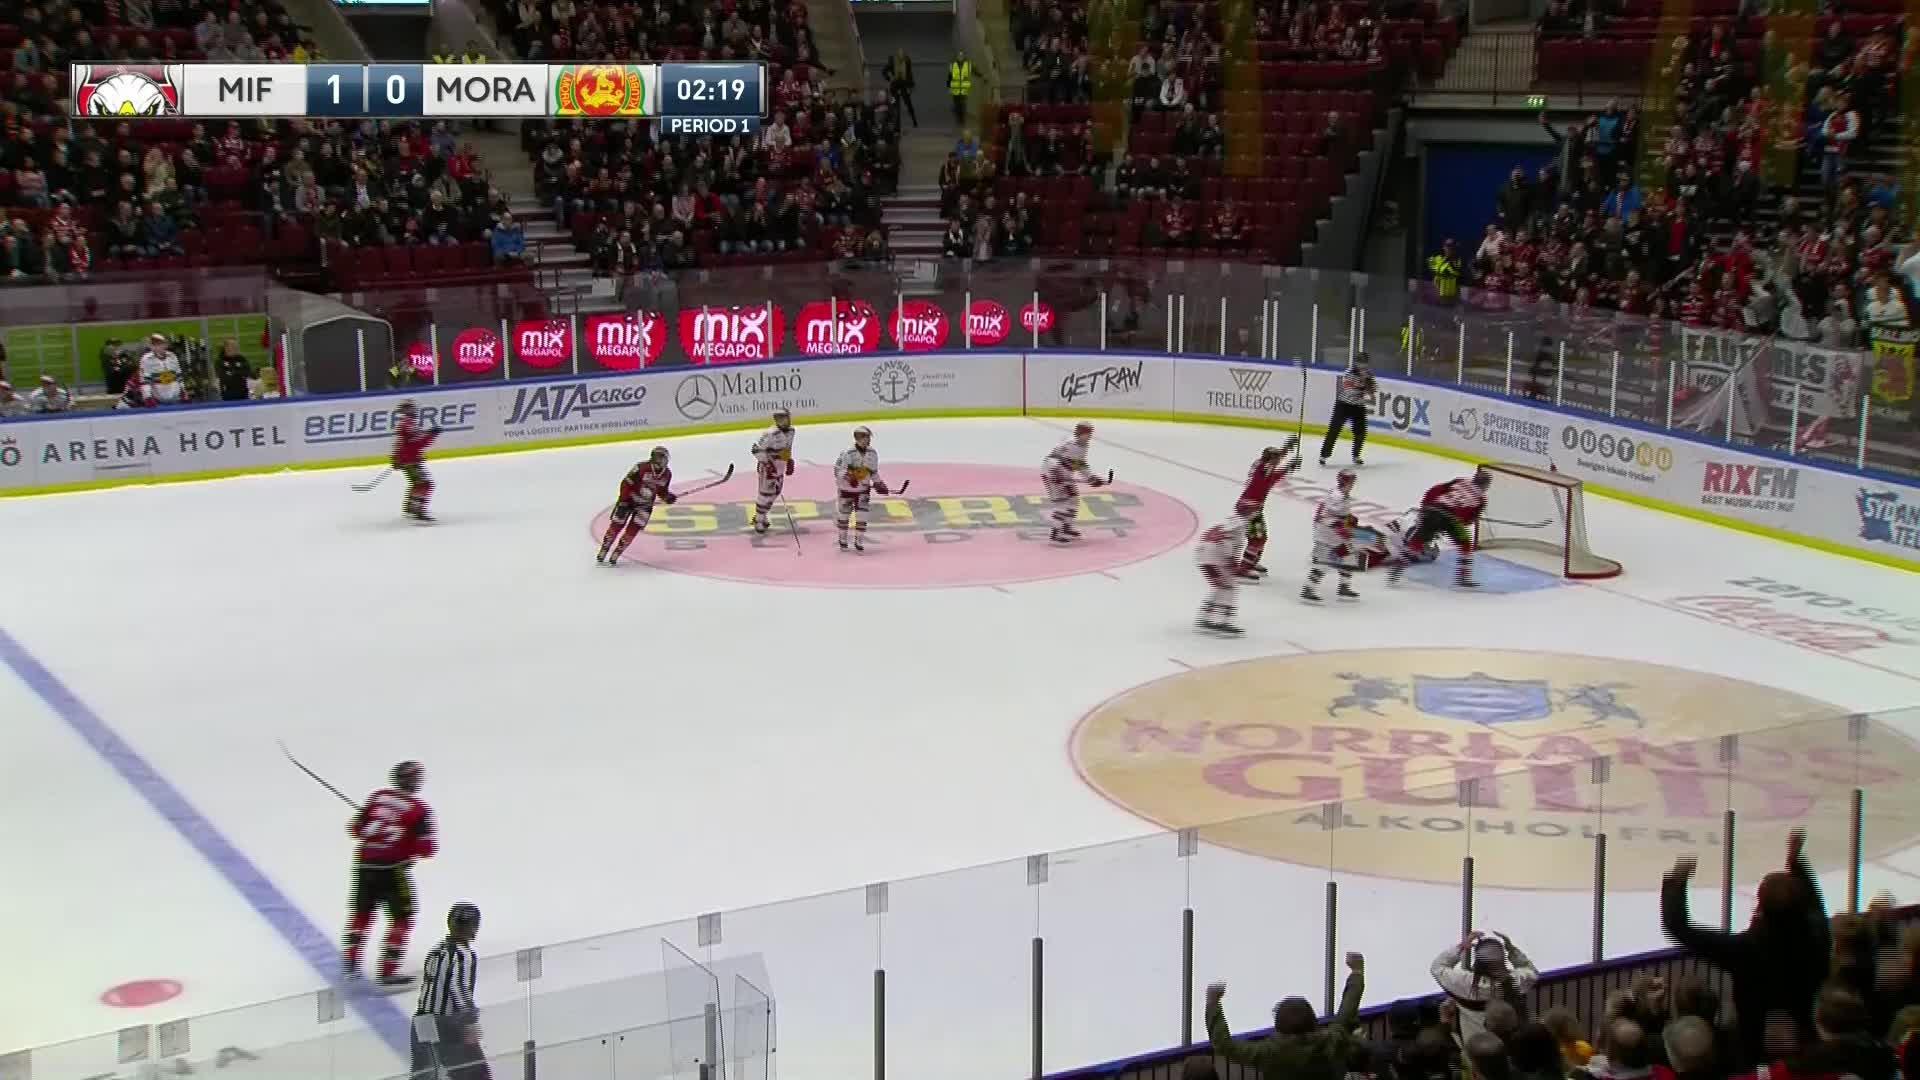 Malmö Redhawks - Mora IK 2-0